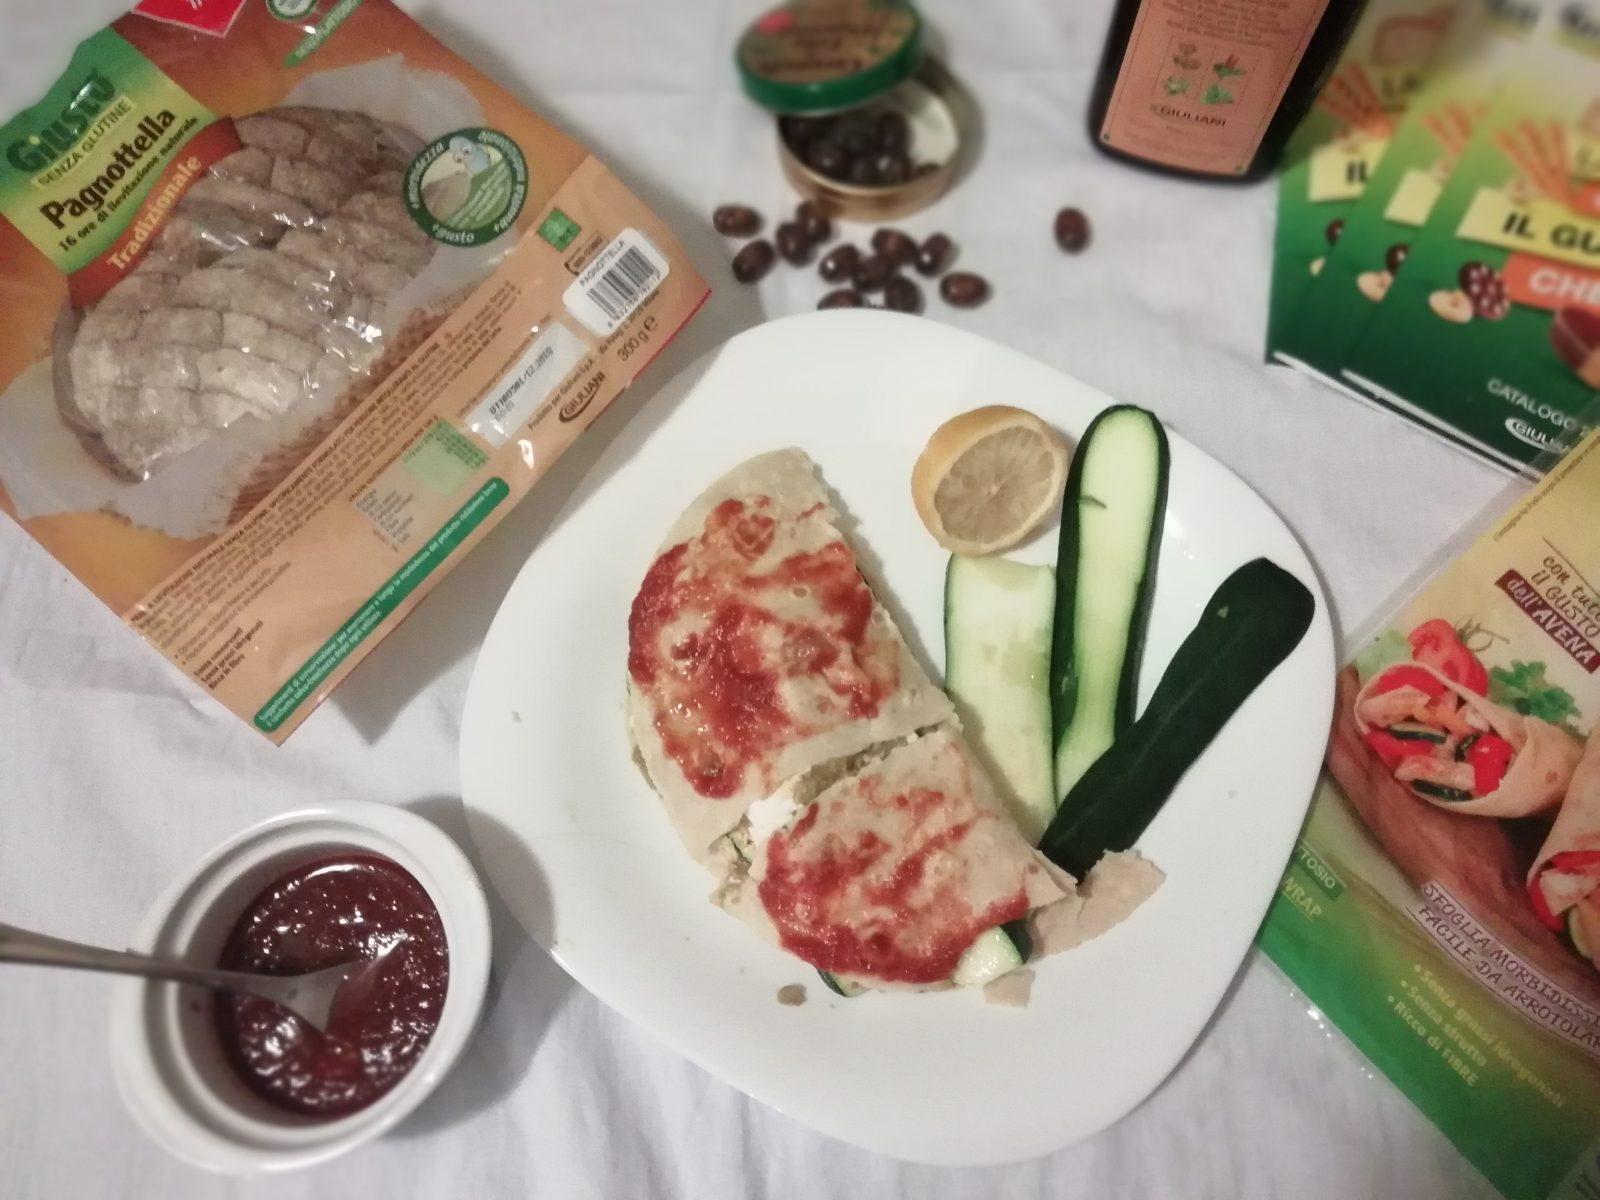 piadina senza glutine con zucchine